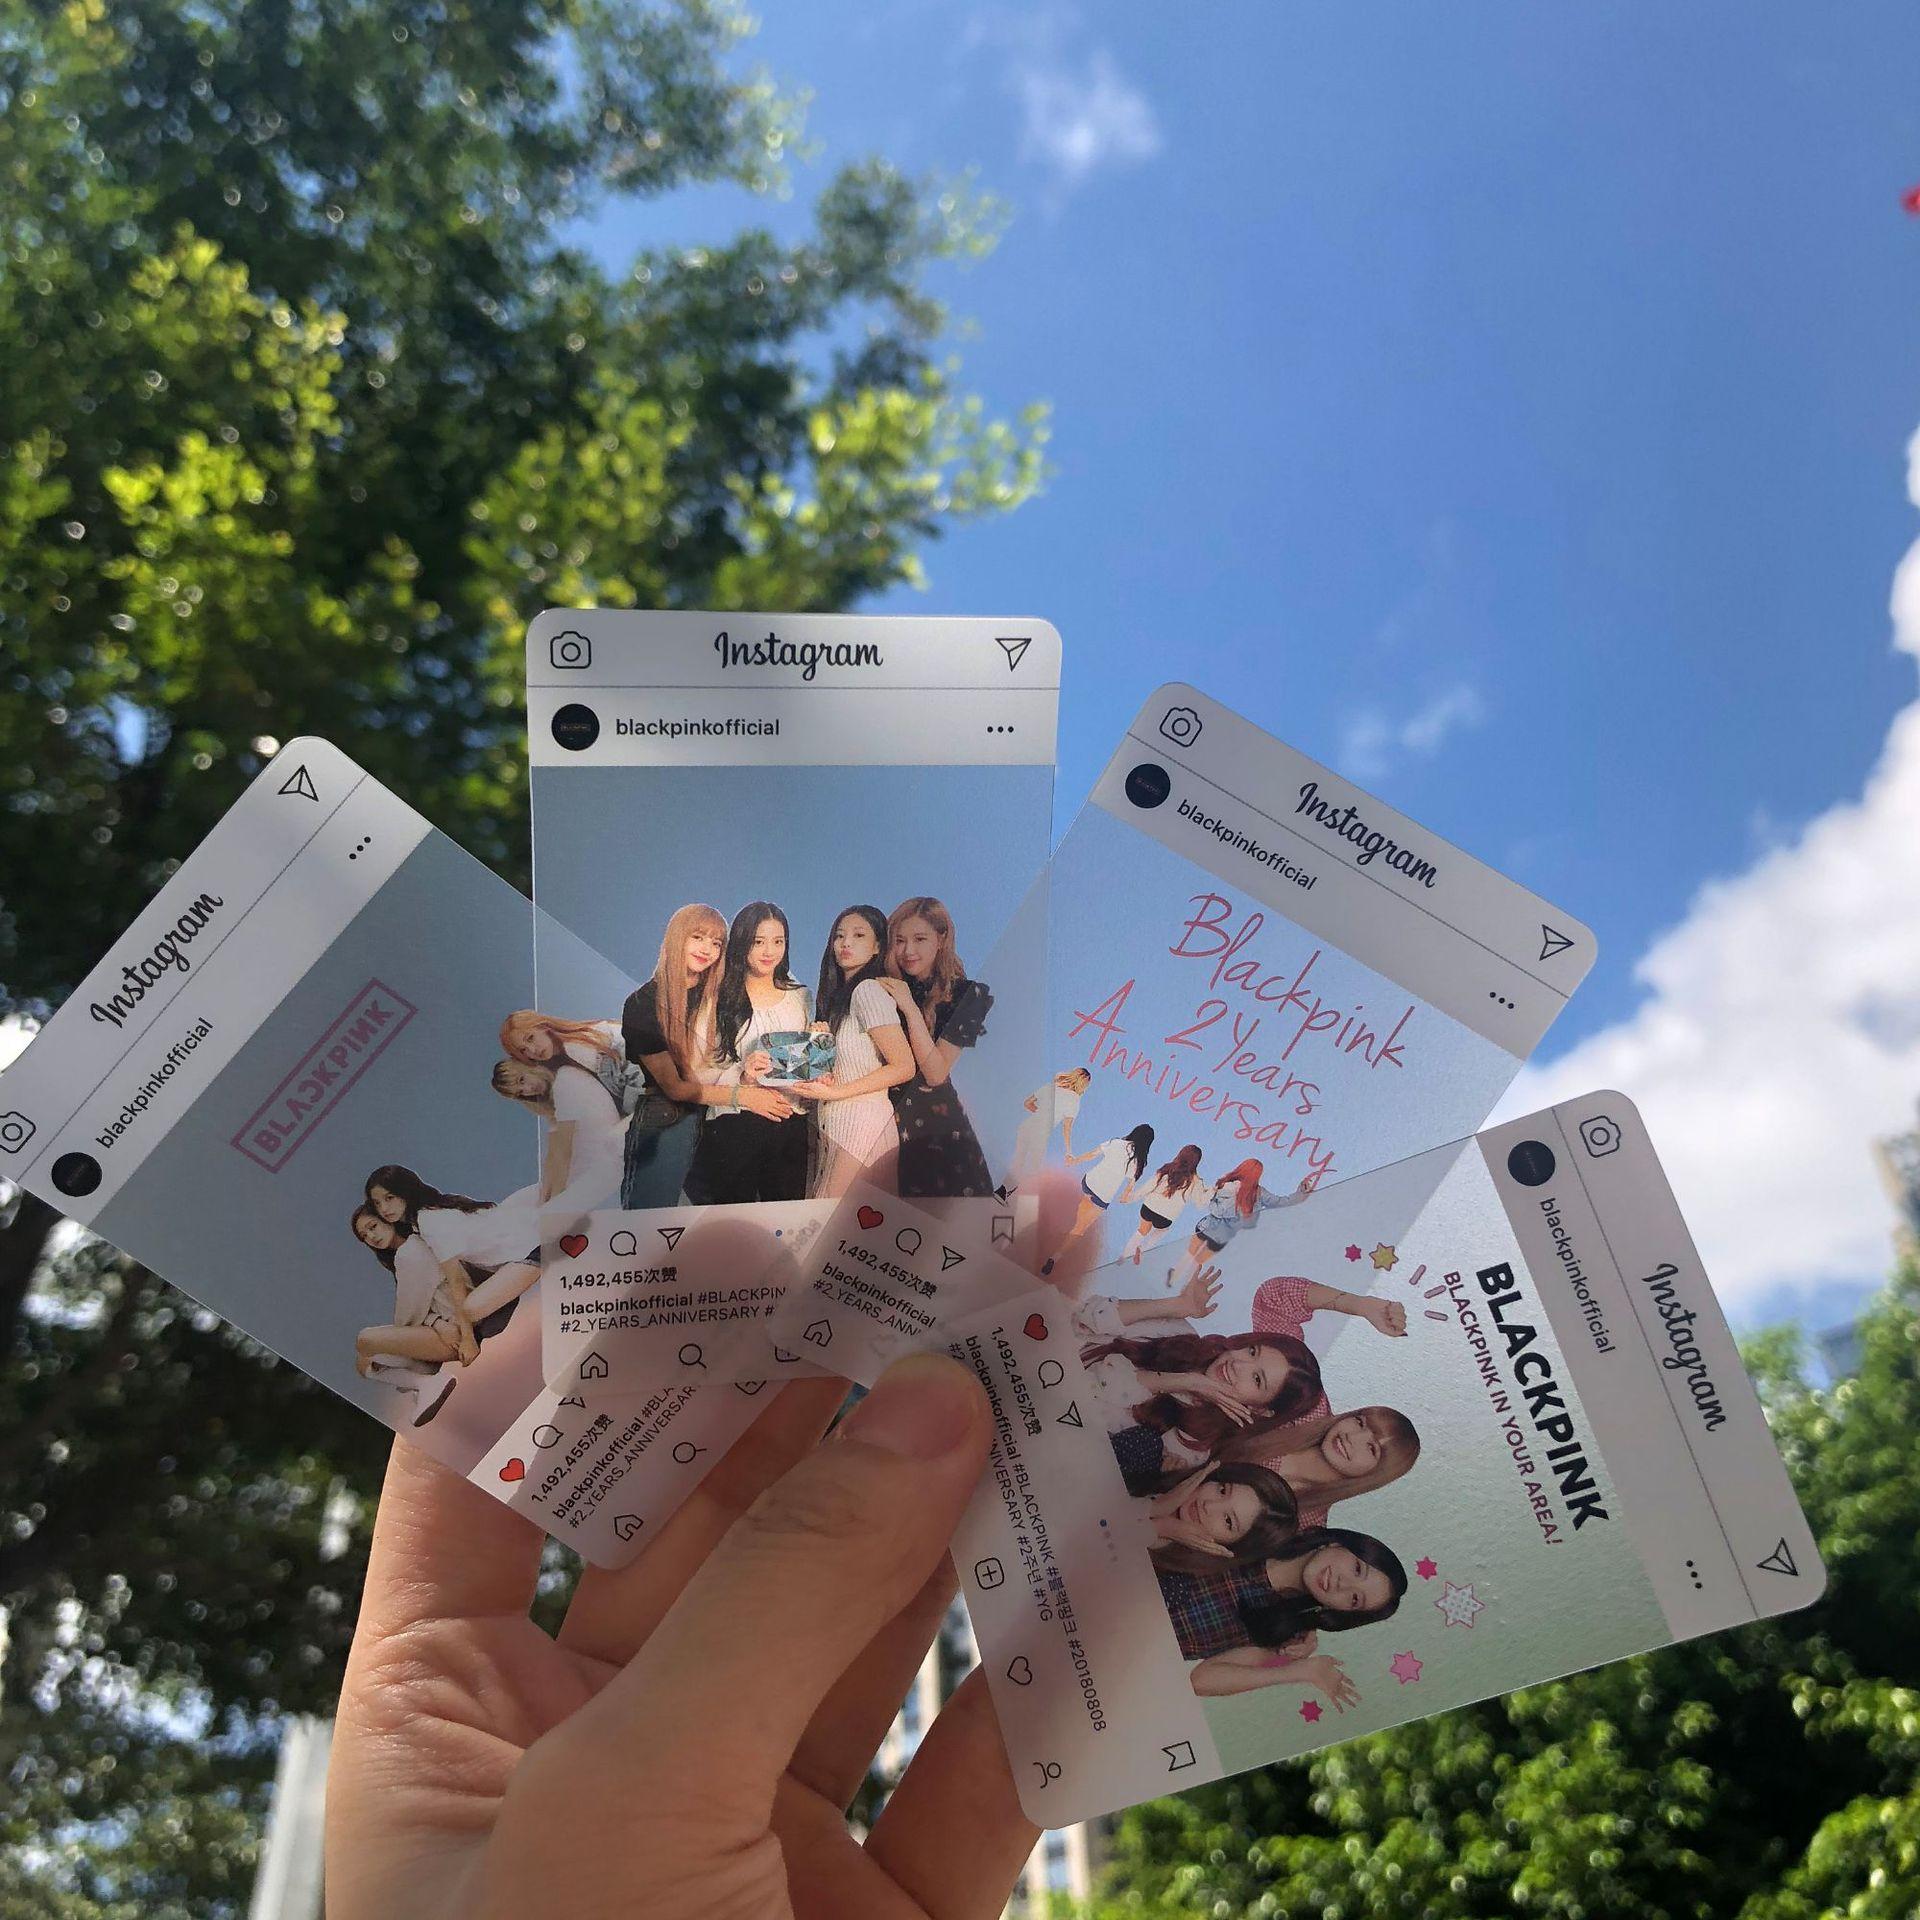 8pcs/set Kpop Blackpink Photocard Album Ins Transparent Girls DIY Paper Photo Card For Fans Collection Jennie Lisa Blackpink